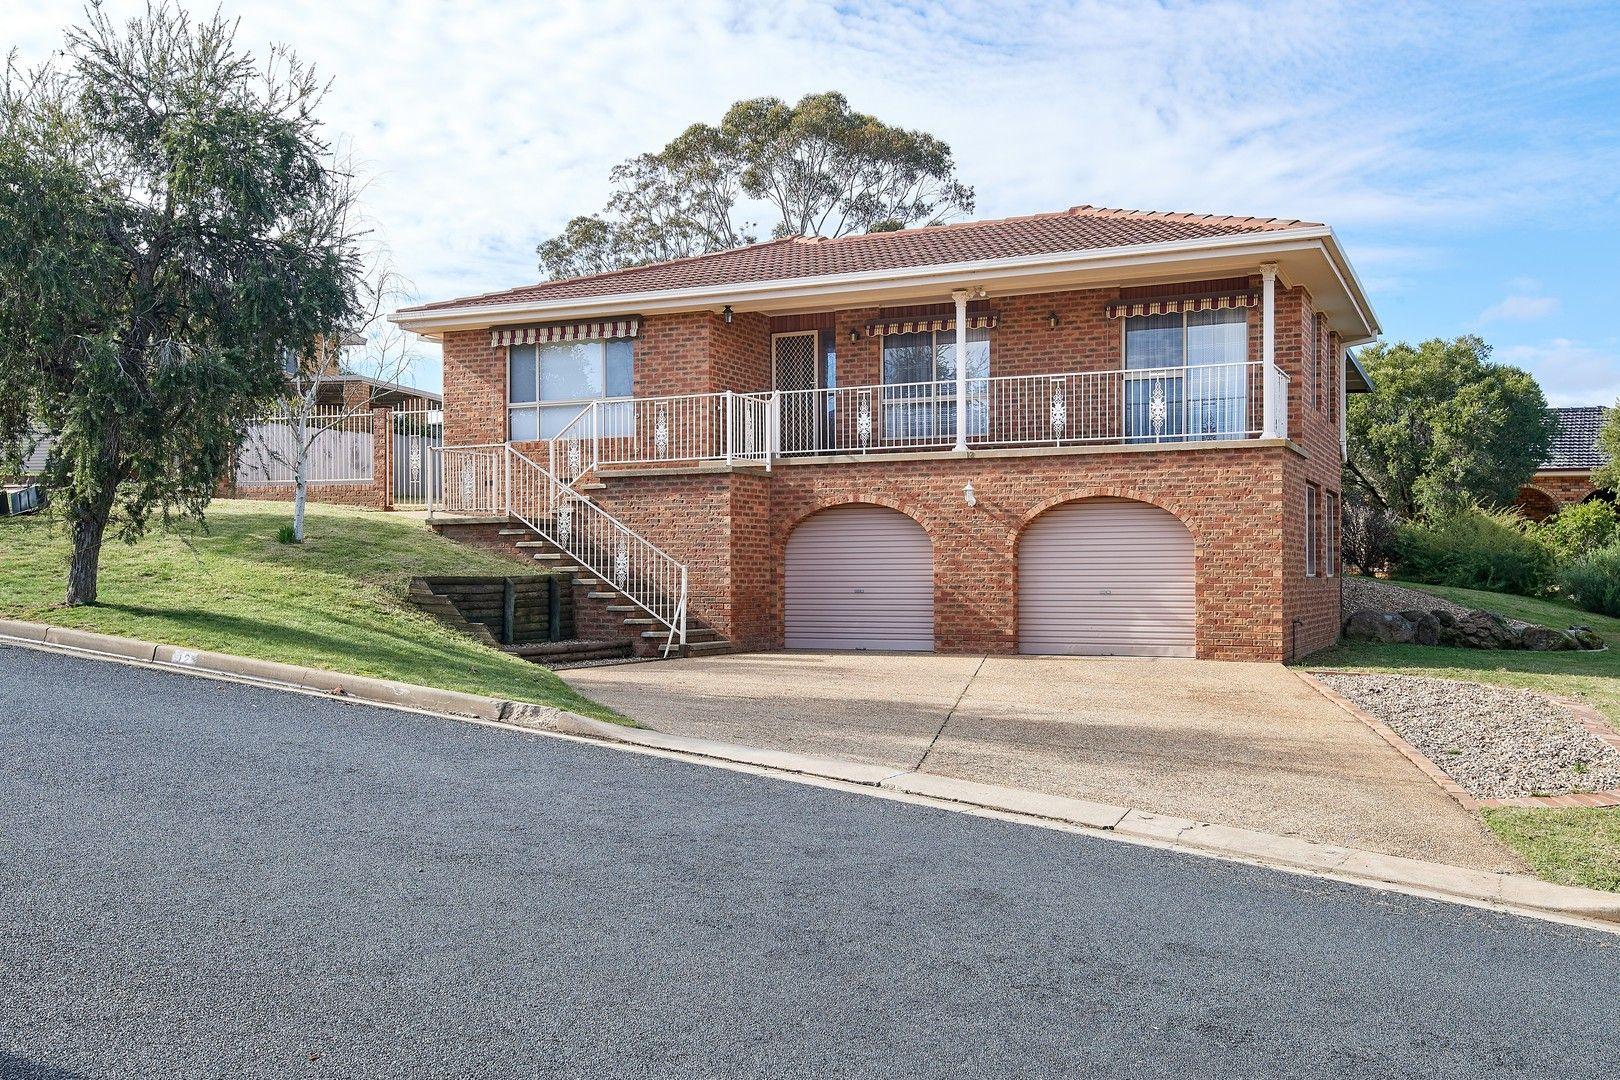 12 Cassia Way, Junee NSW 2663, Image 0